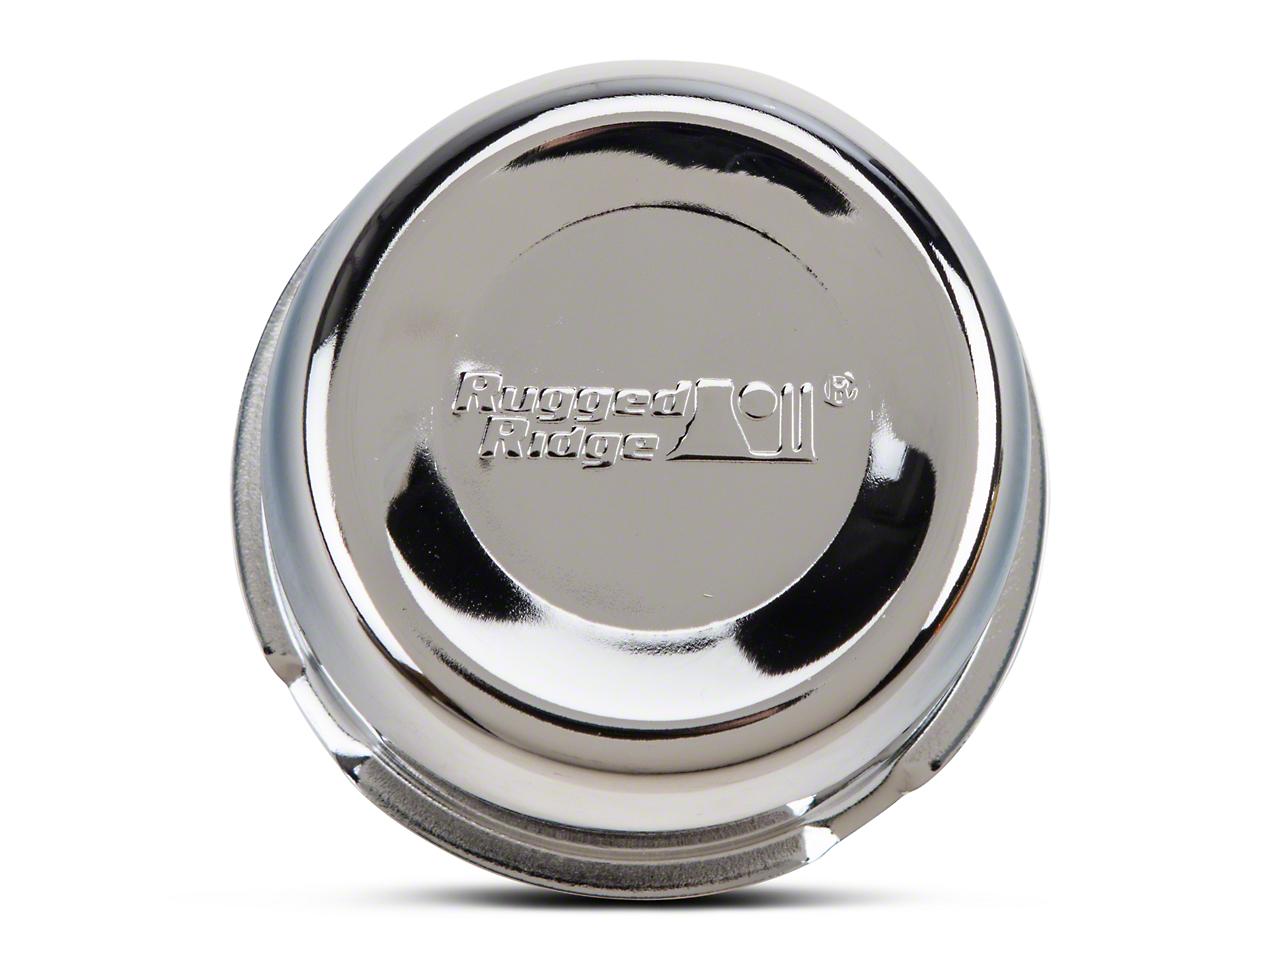 Rugged Ridge 5x4.5 in. Steel Wheel Center Cap - Chrome (87-06 Jeep Wrangler YJ & TJ)